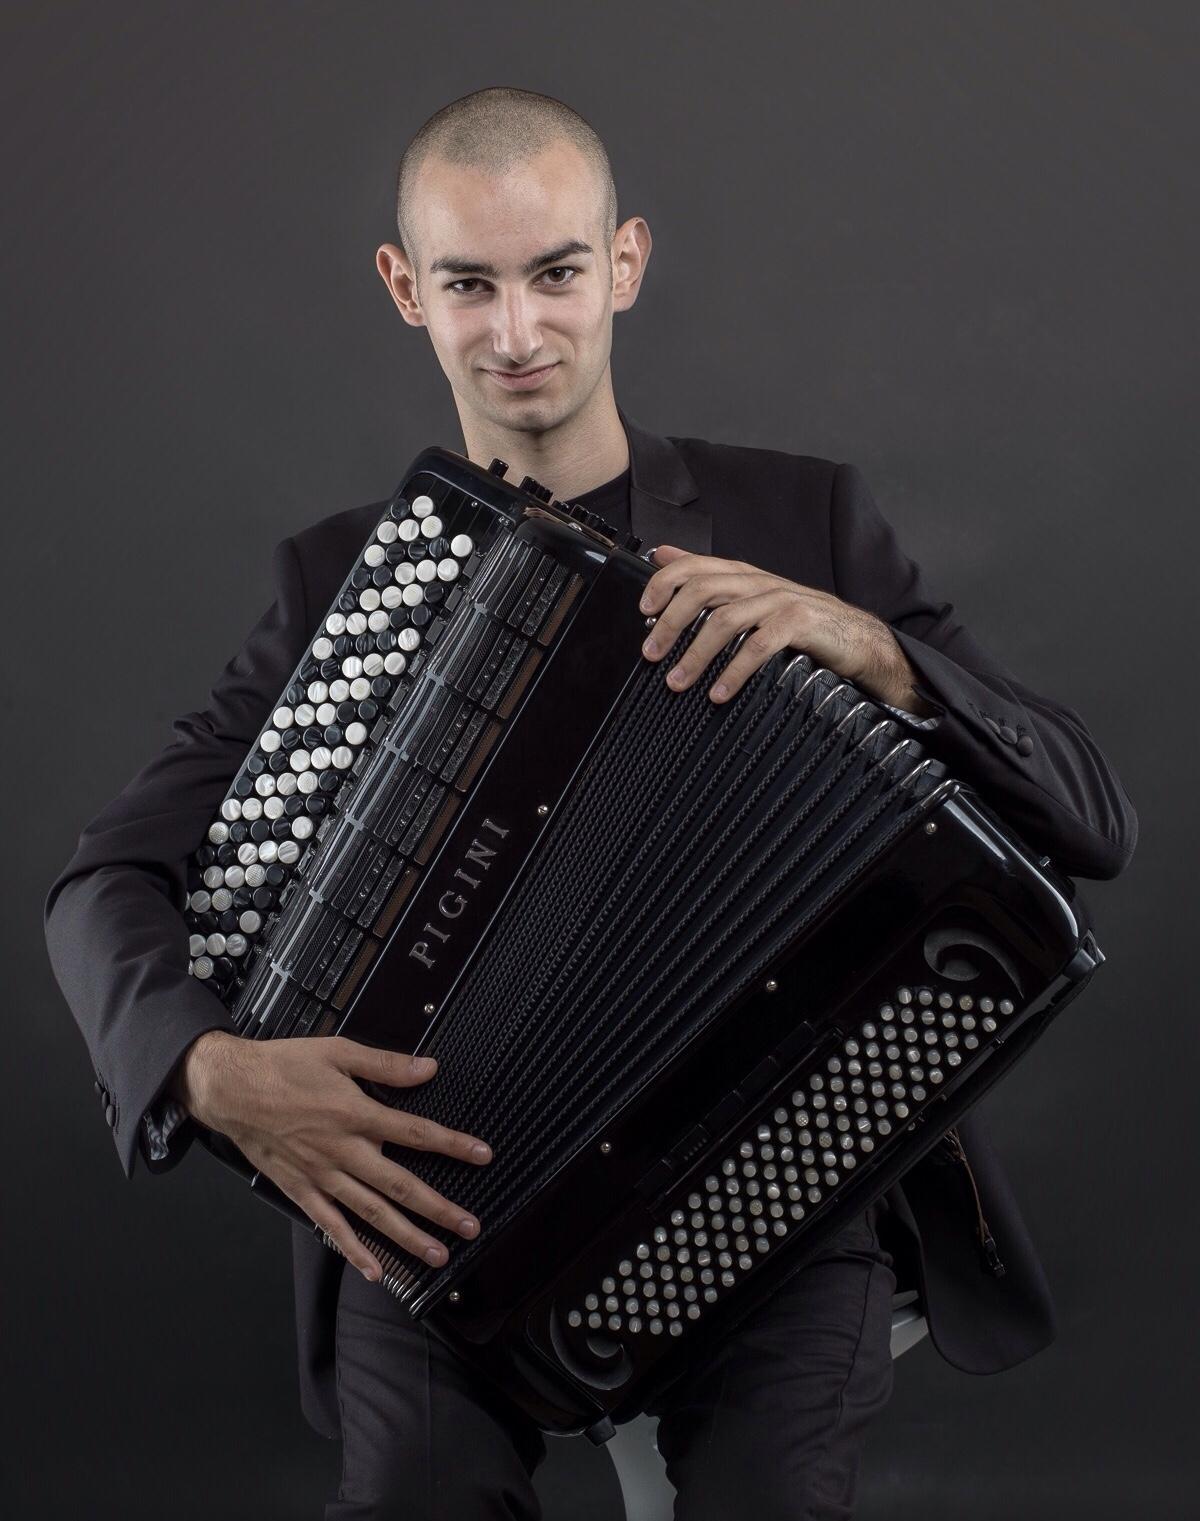 Giancarlo Palena - Accordion Player.jpeg